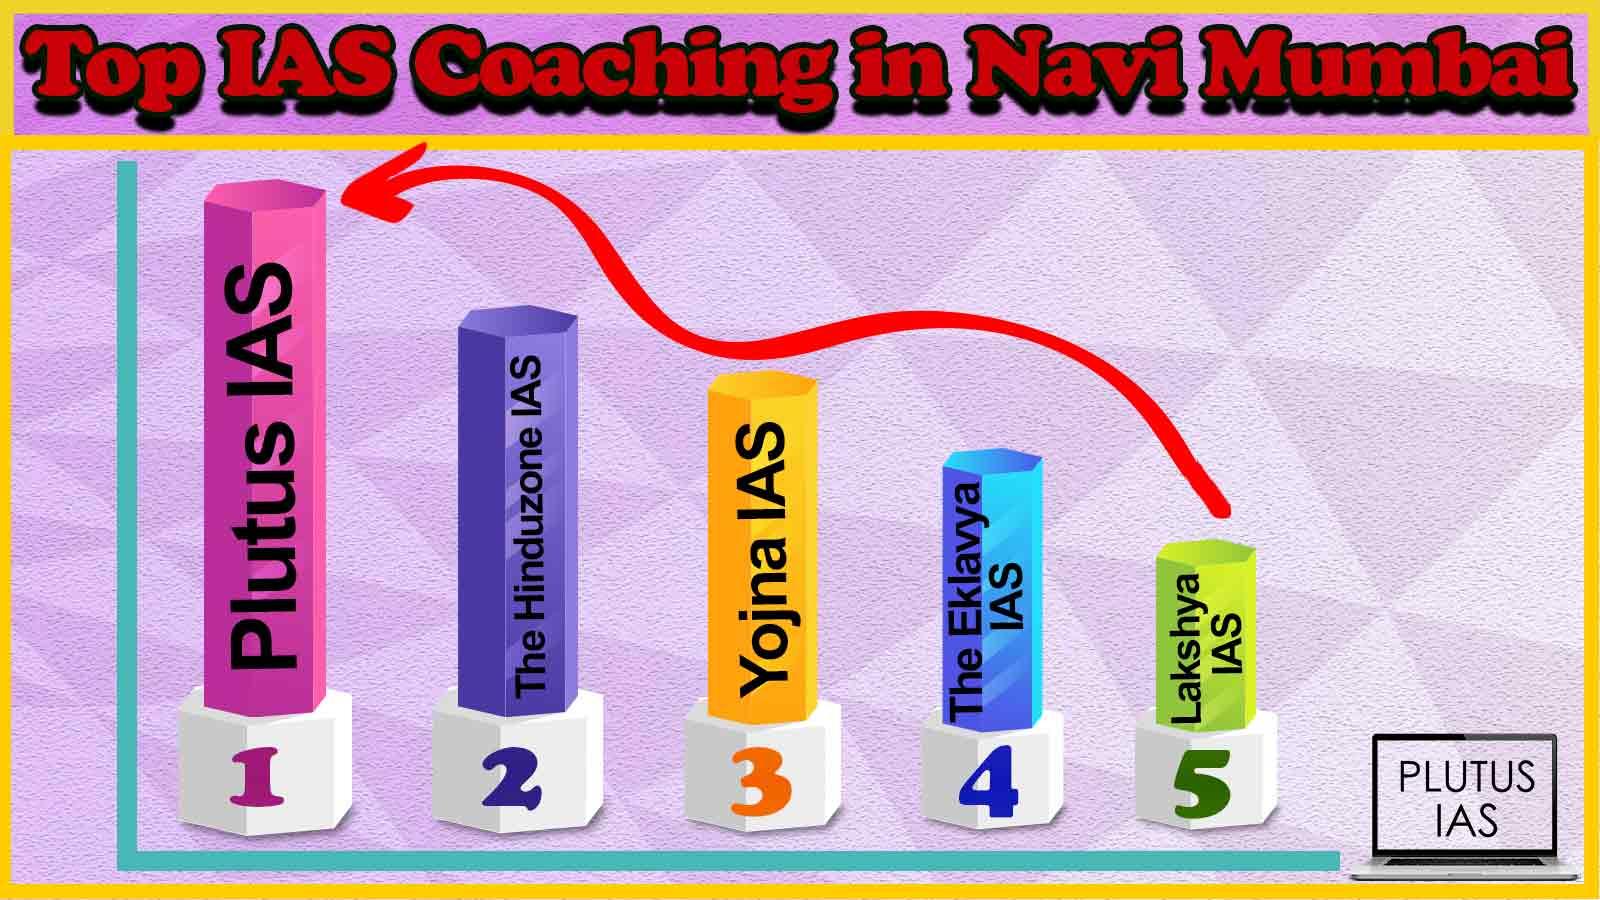 Best 10 IAS Coaching in Navi Mumbai